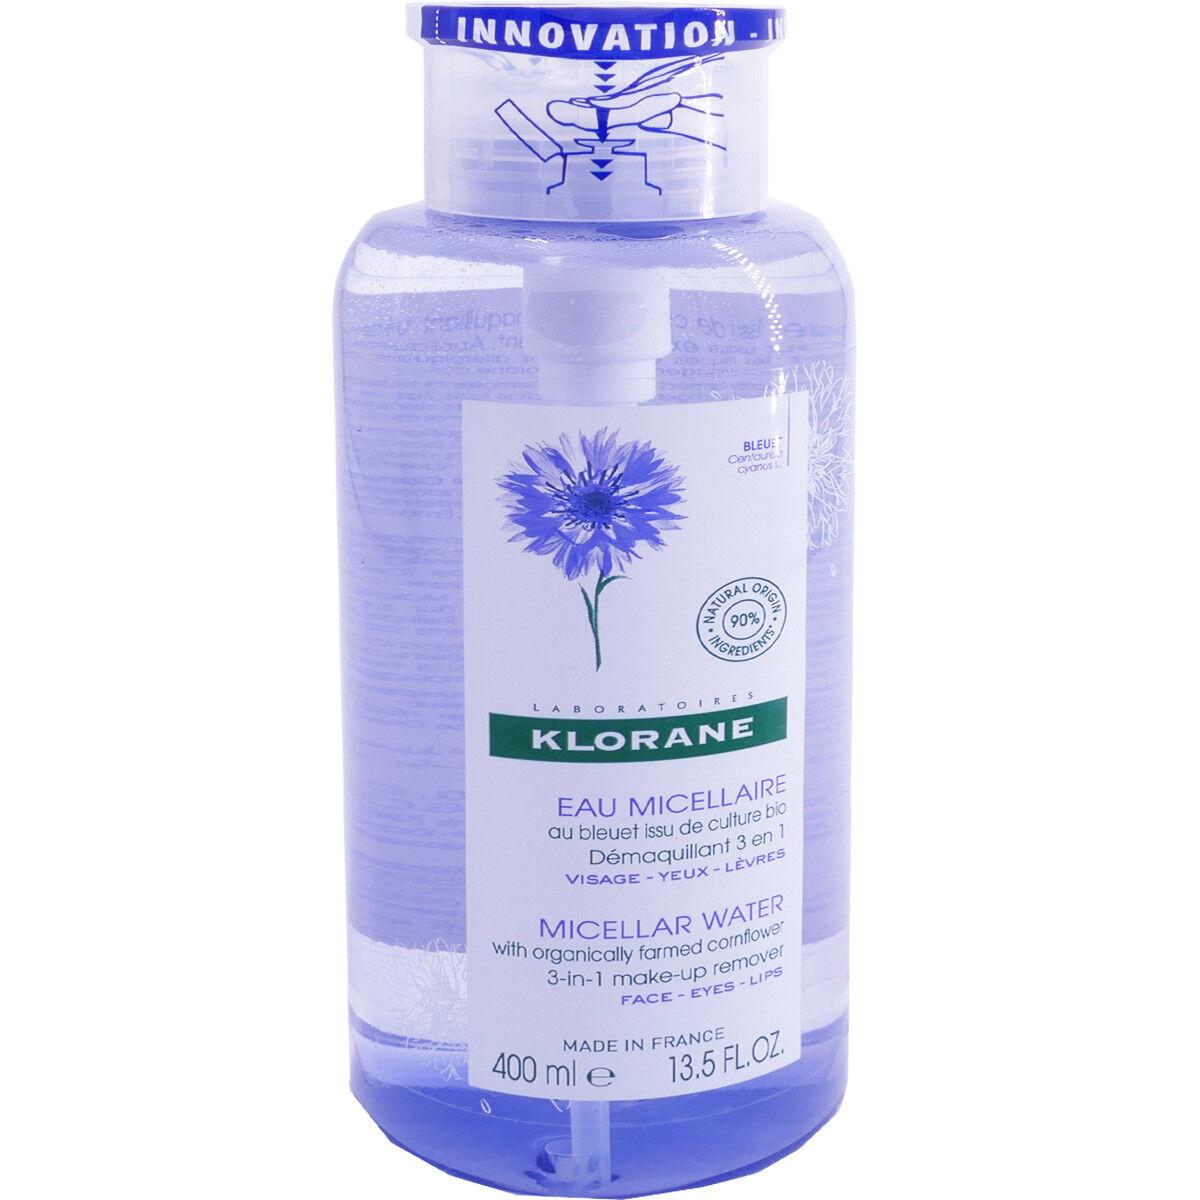 Klorane eau micellaire bleuet 400 ml